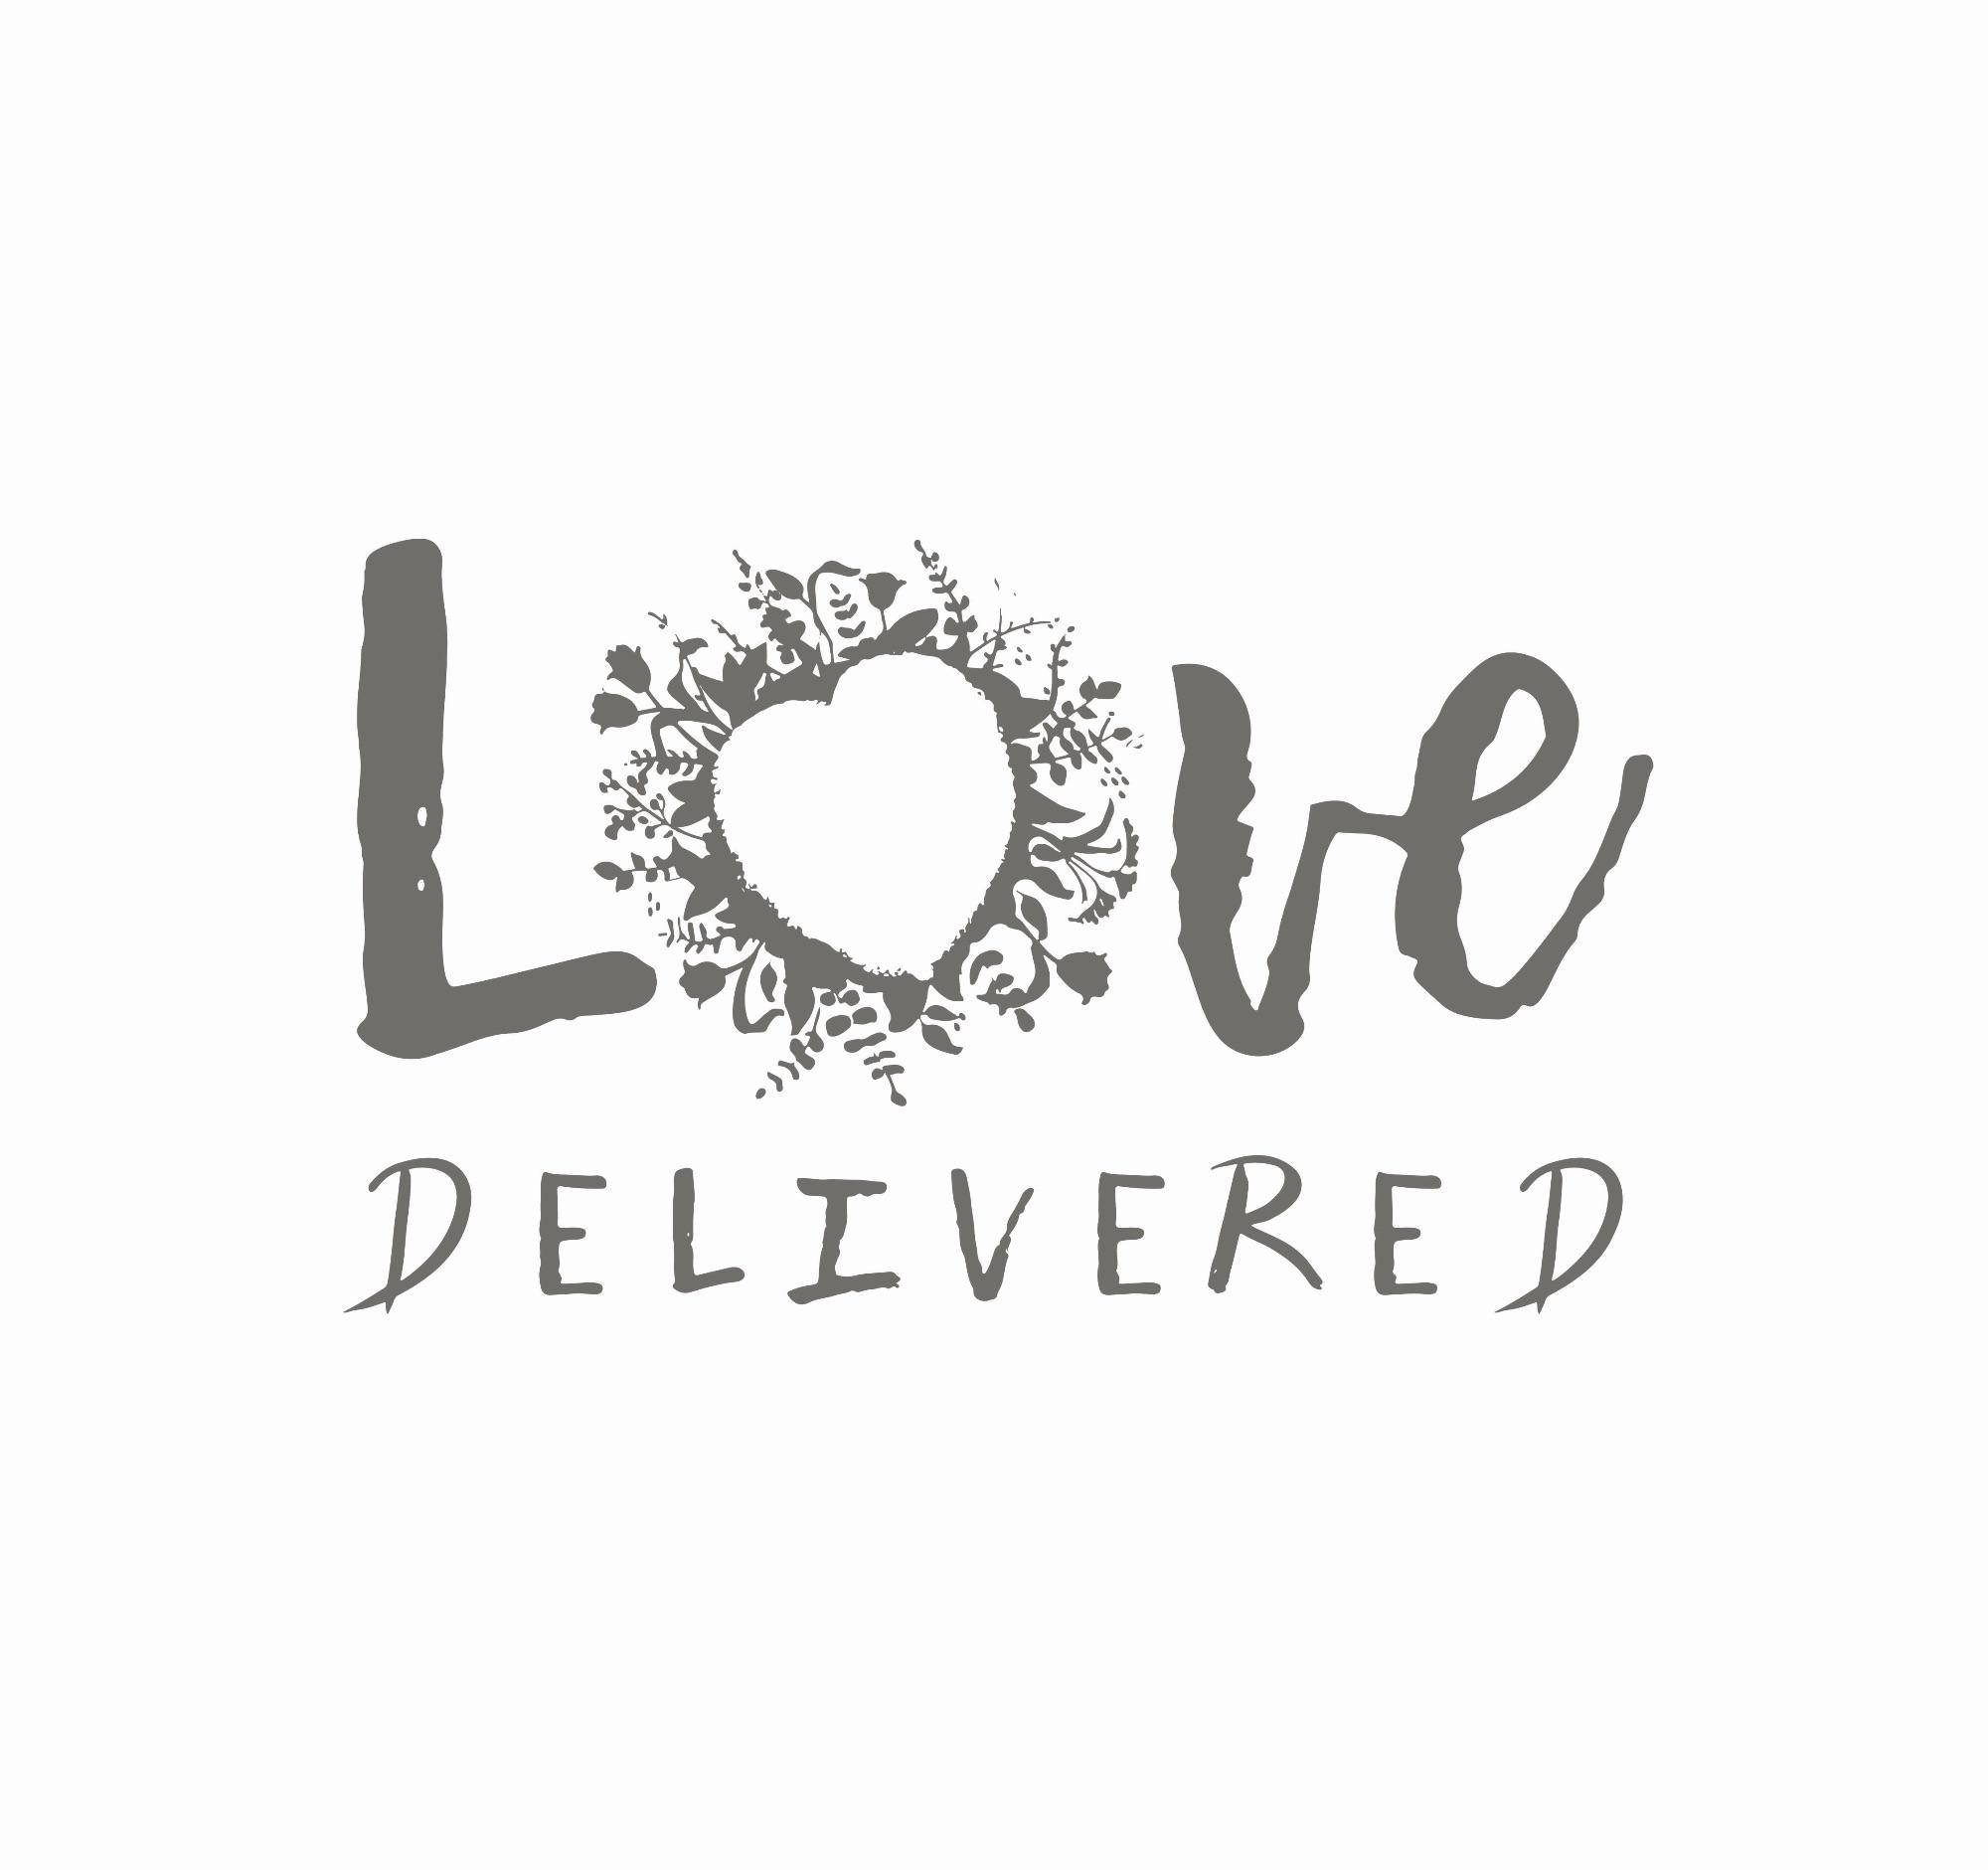 Love delivered logo grey for white stock.jpg